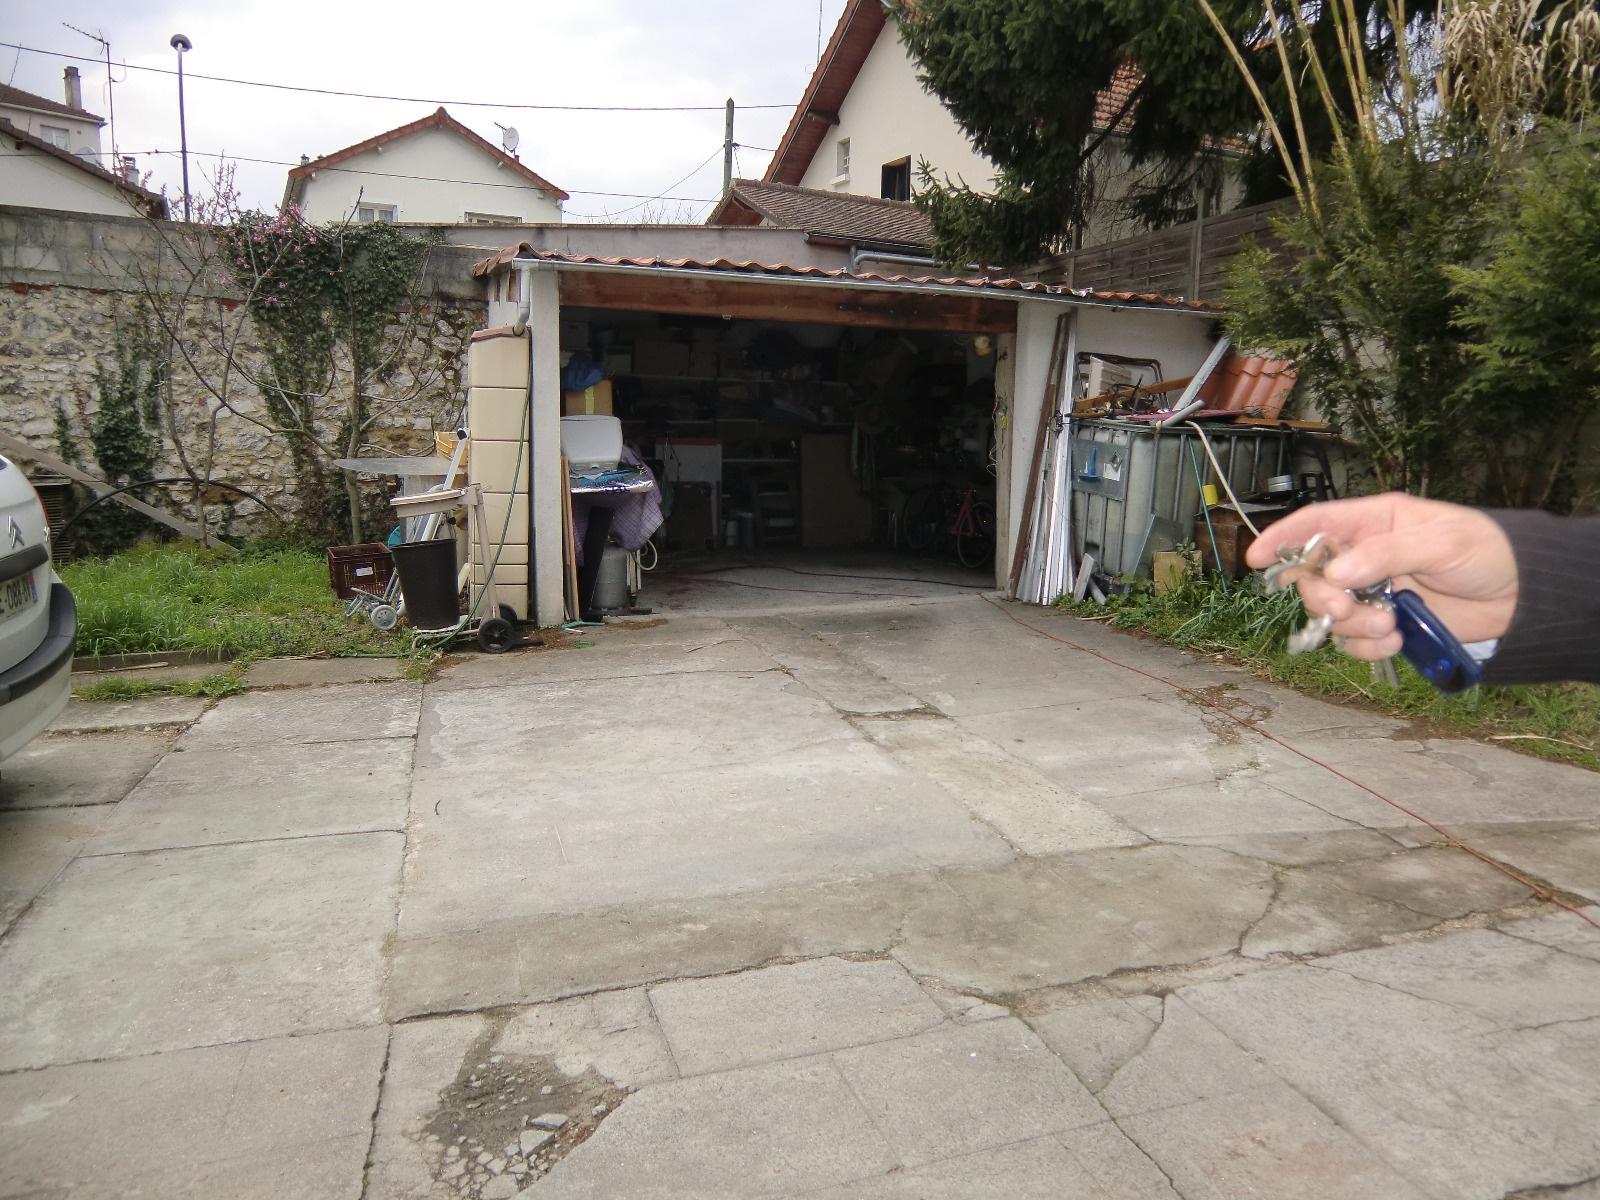 Vente champigny sur marne 5 39 rer eole for Garage a champigny sur marne